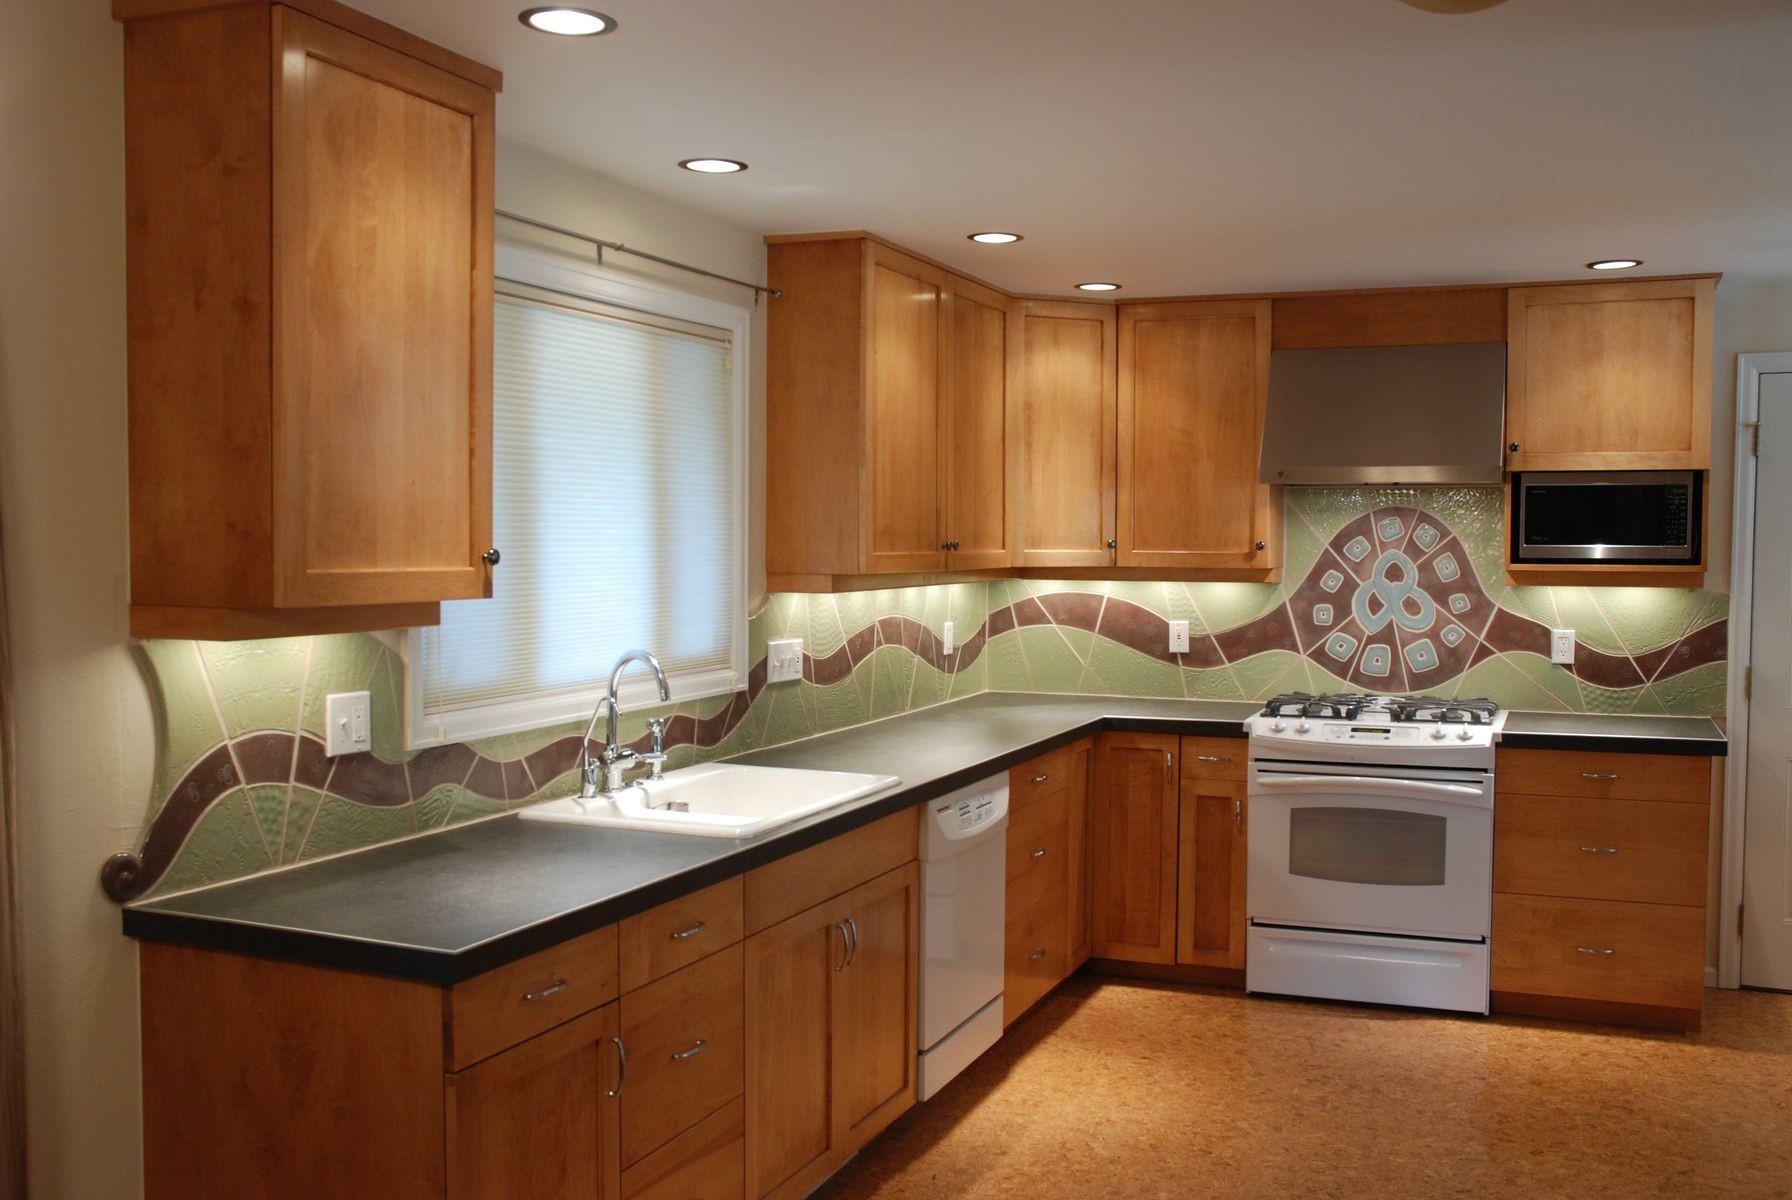 Tile Backsplash Kitchen  Ceramic Tile Backsplash Perfect Backsplash to Beautify